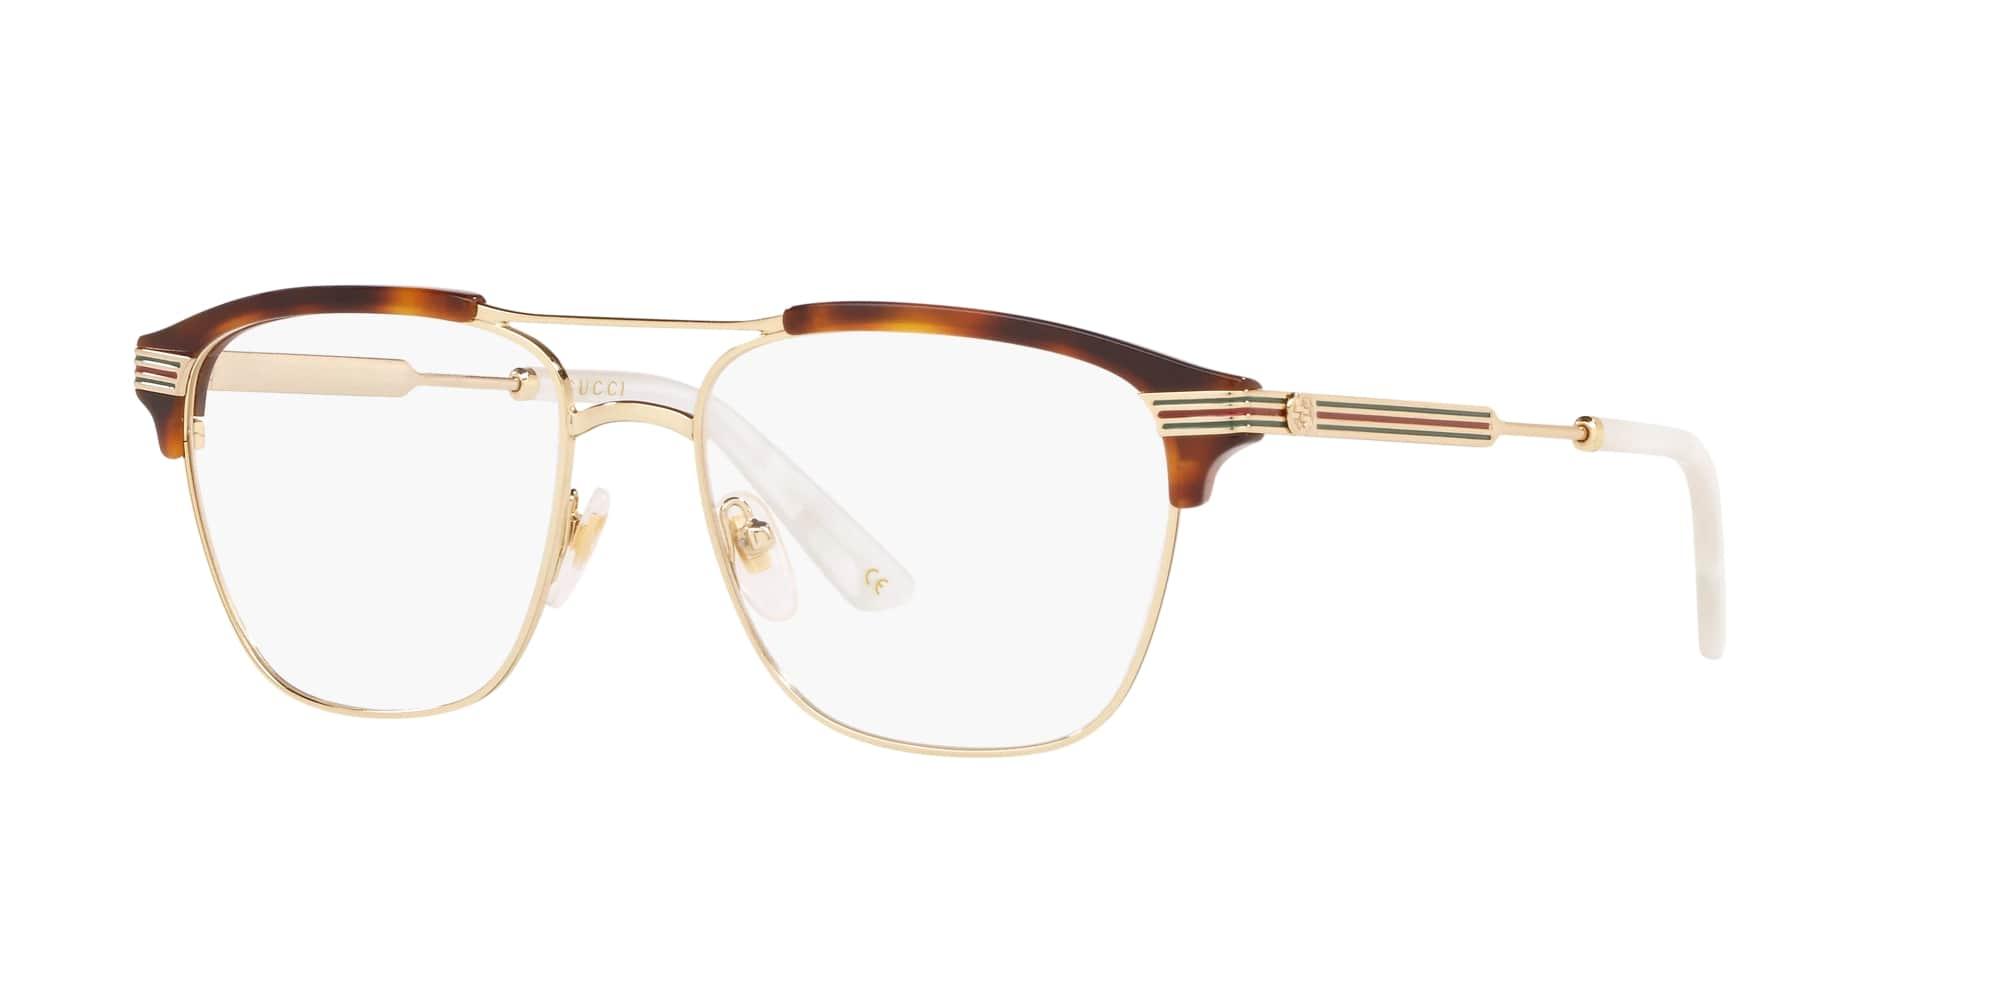 Gucci semi-rimmed eyeglasses